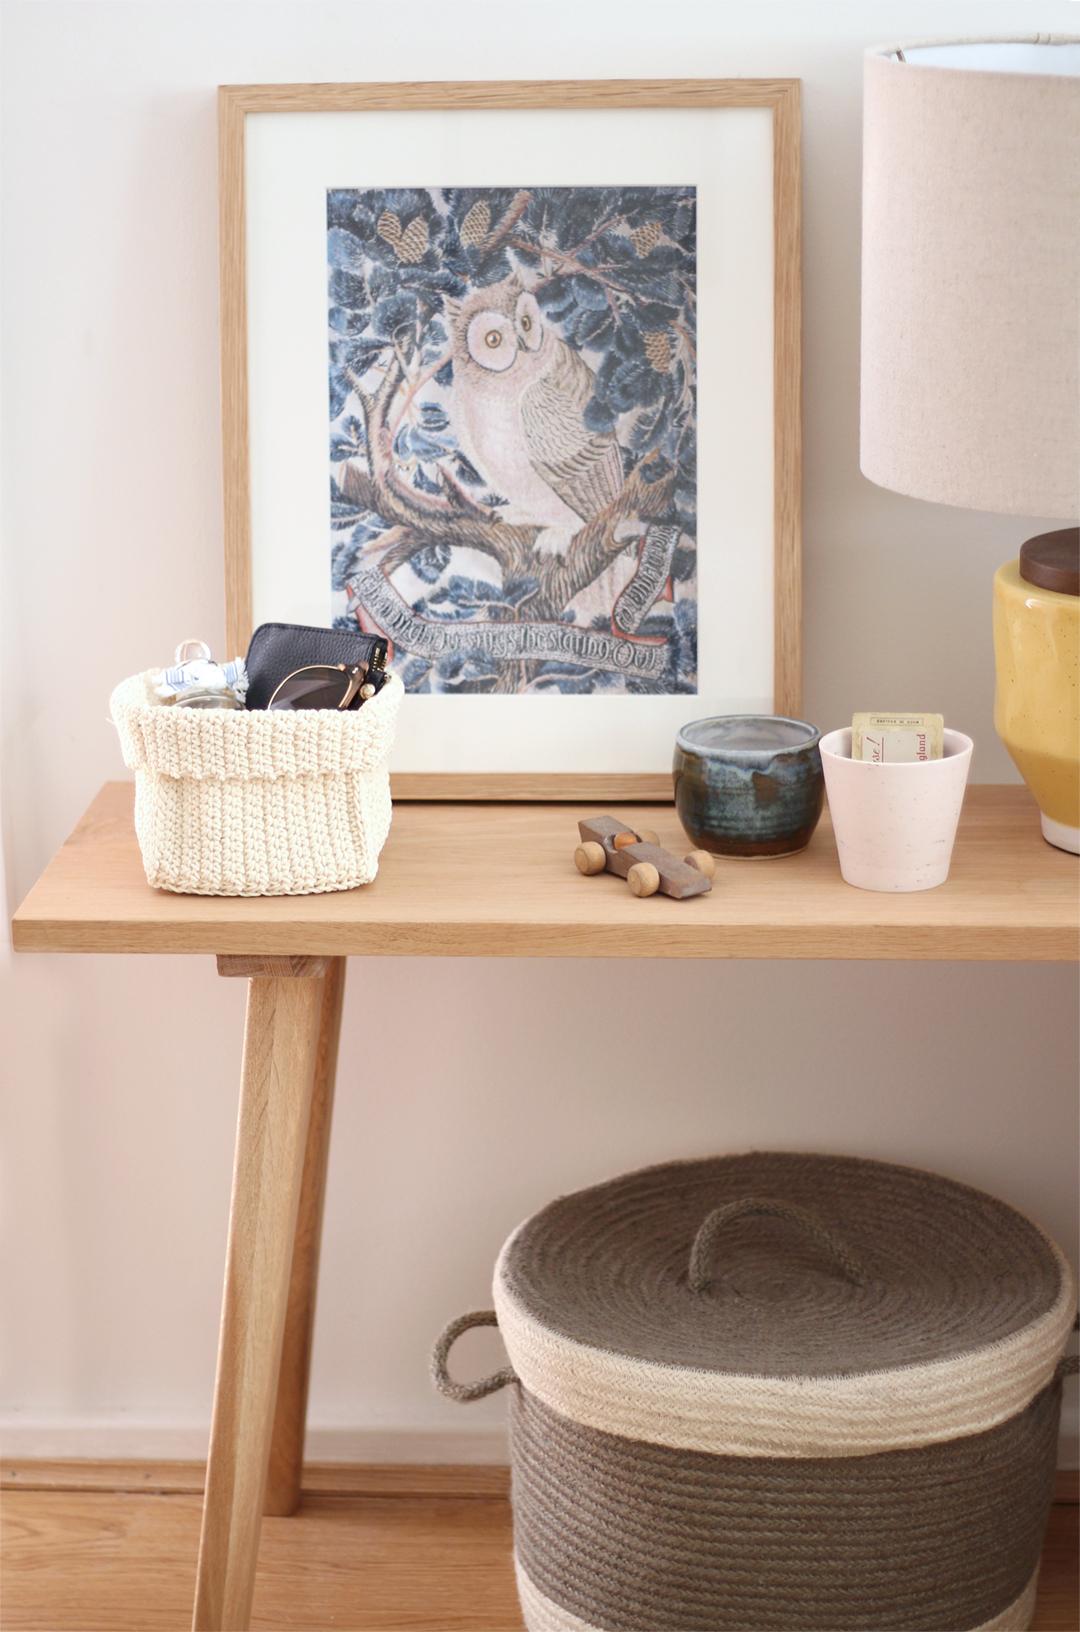 Nancy-Straughan-interior-stylist-king-mcgaw-art-prints.jpg